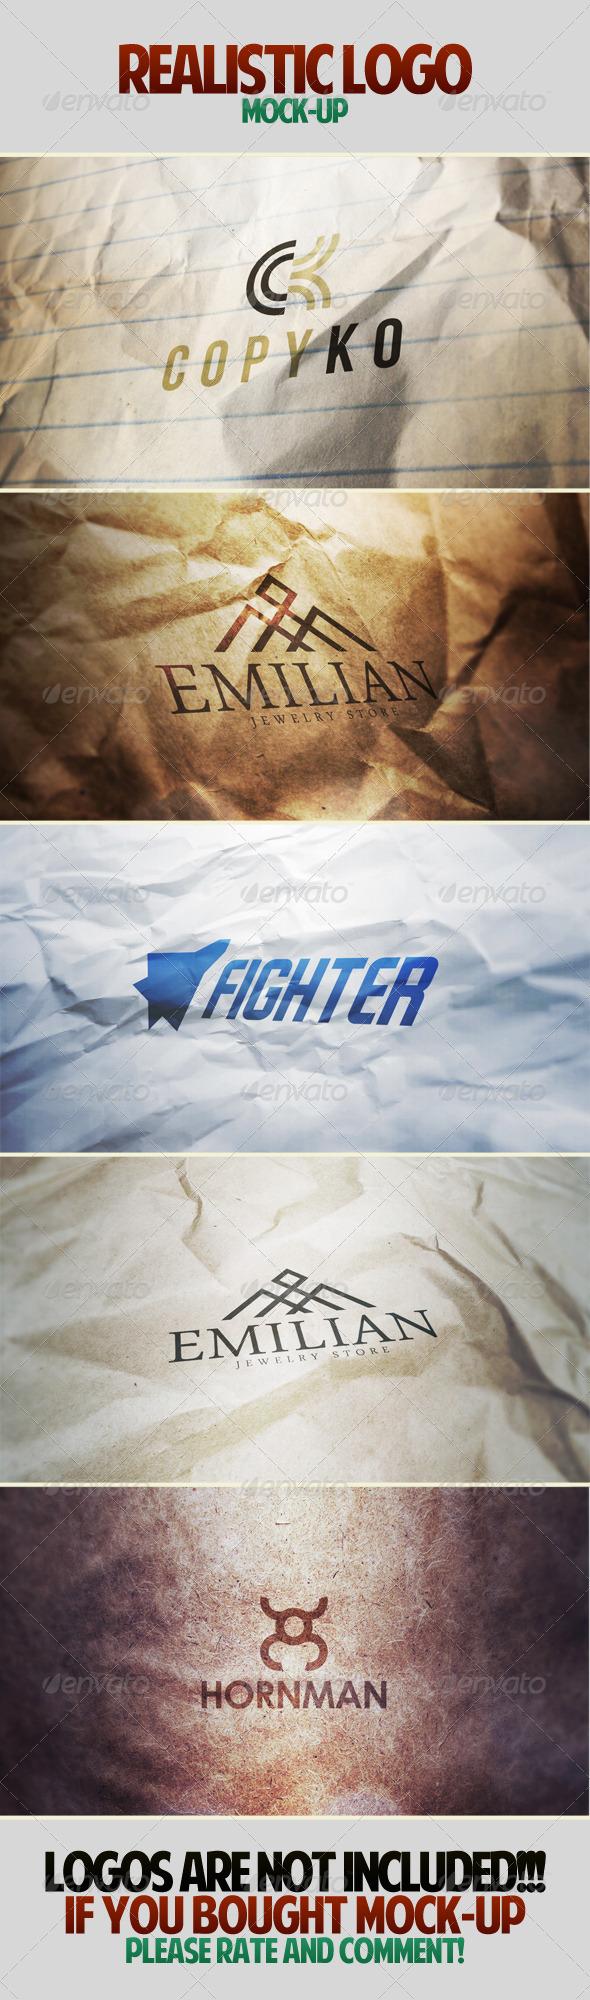 Realistic Logo Mockup - Logo Product Mock-Ups